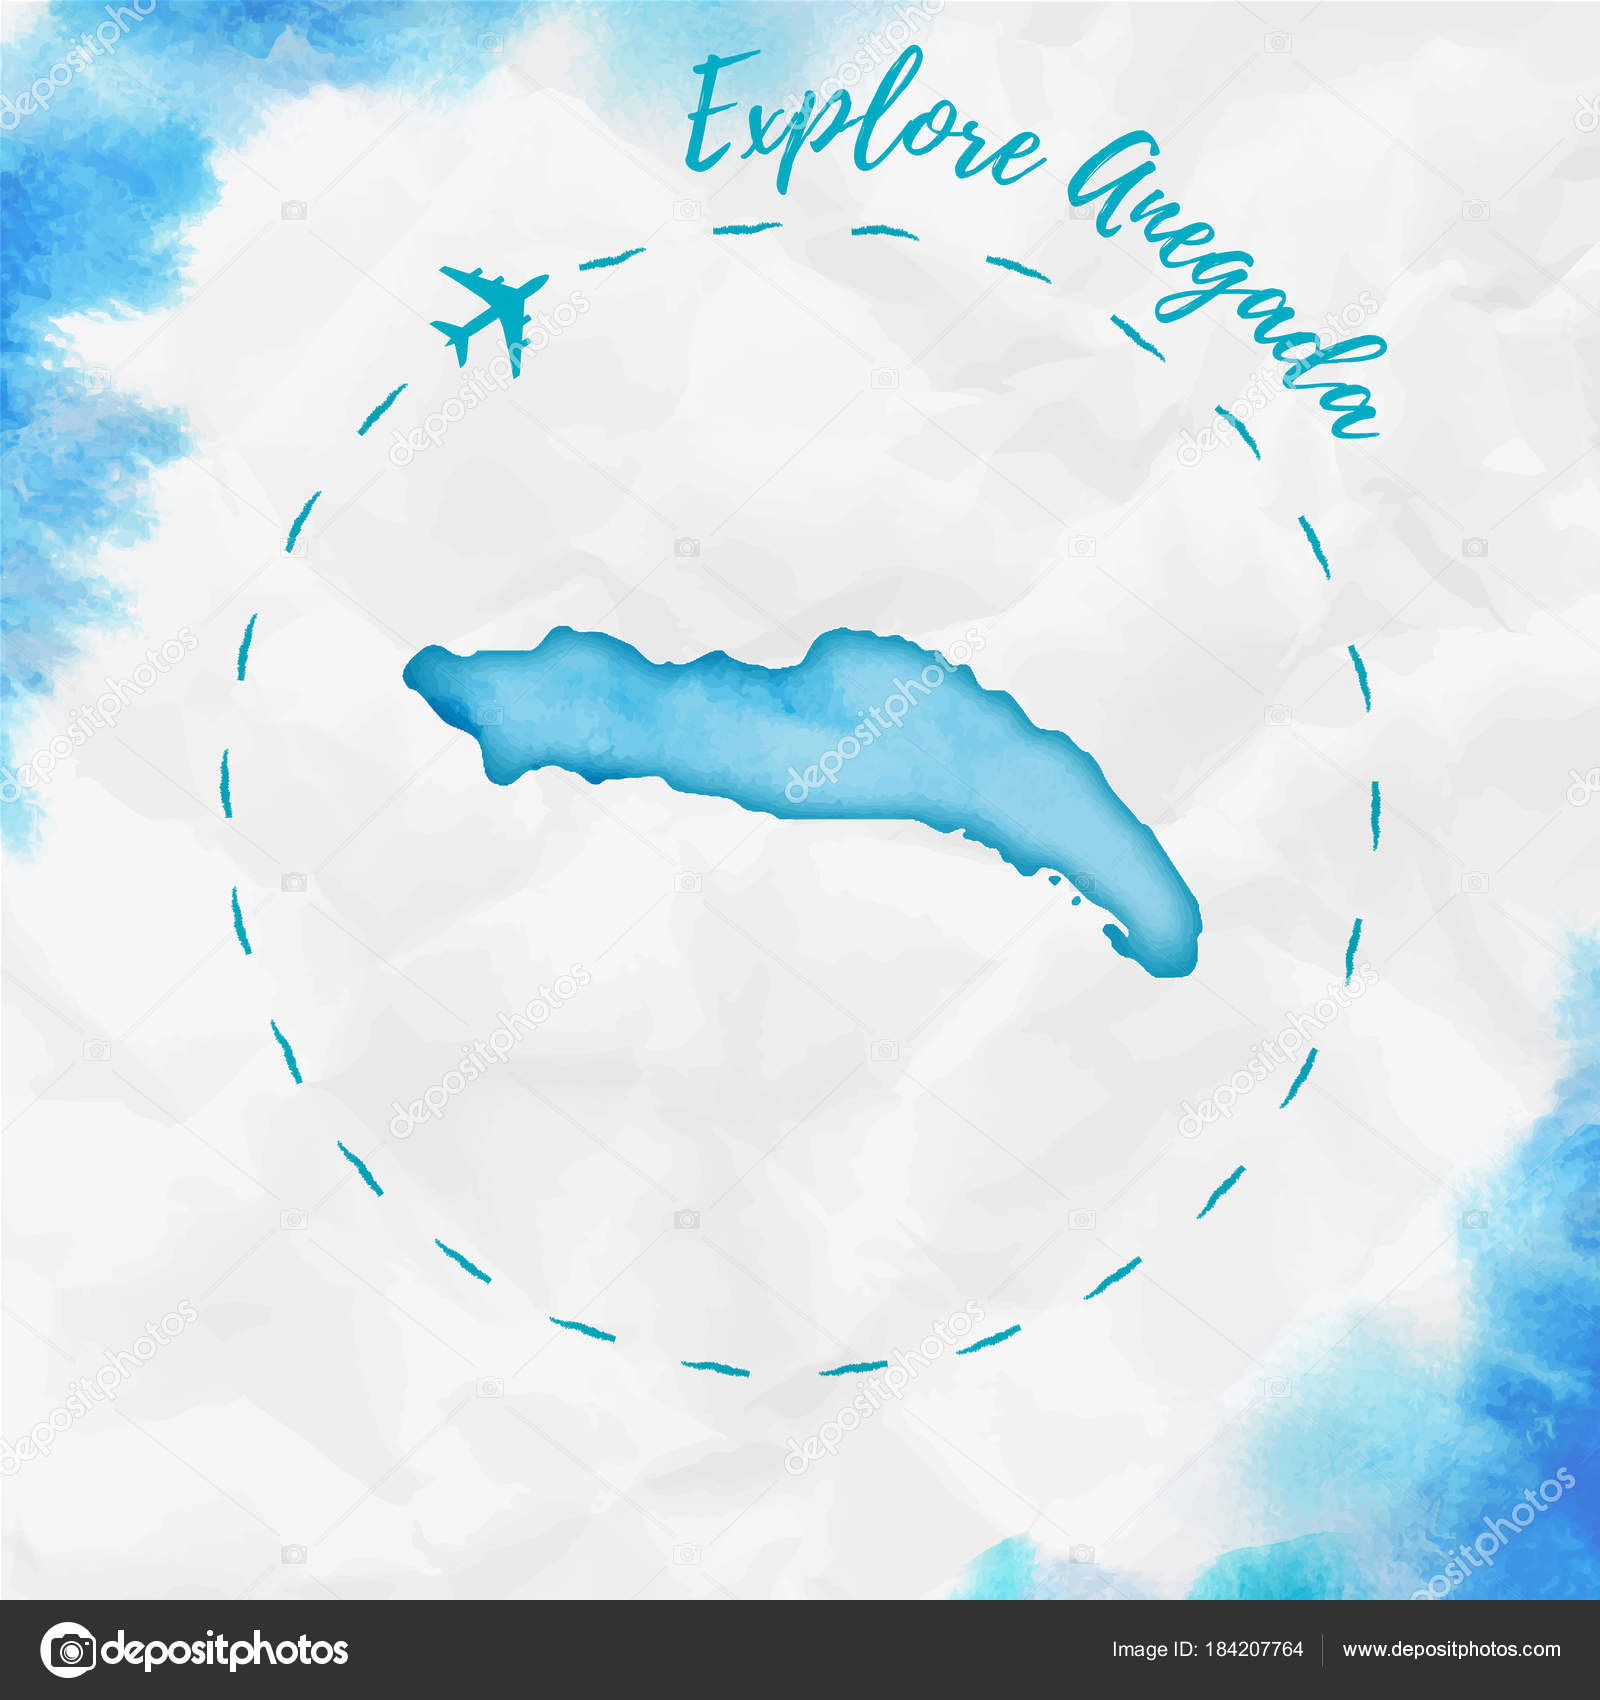 Anegada watercolor island map in turquoise colors Explore Anegada